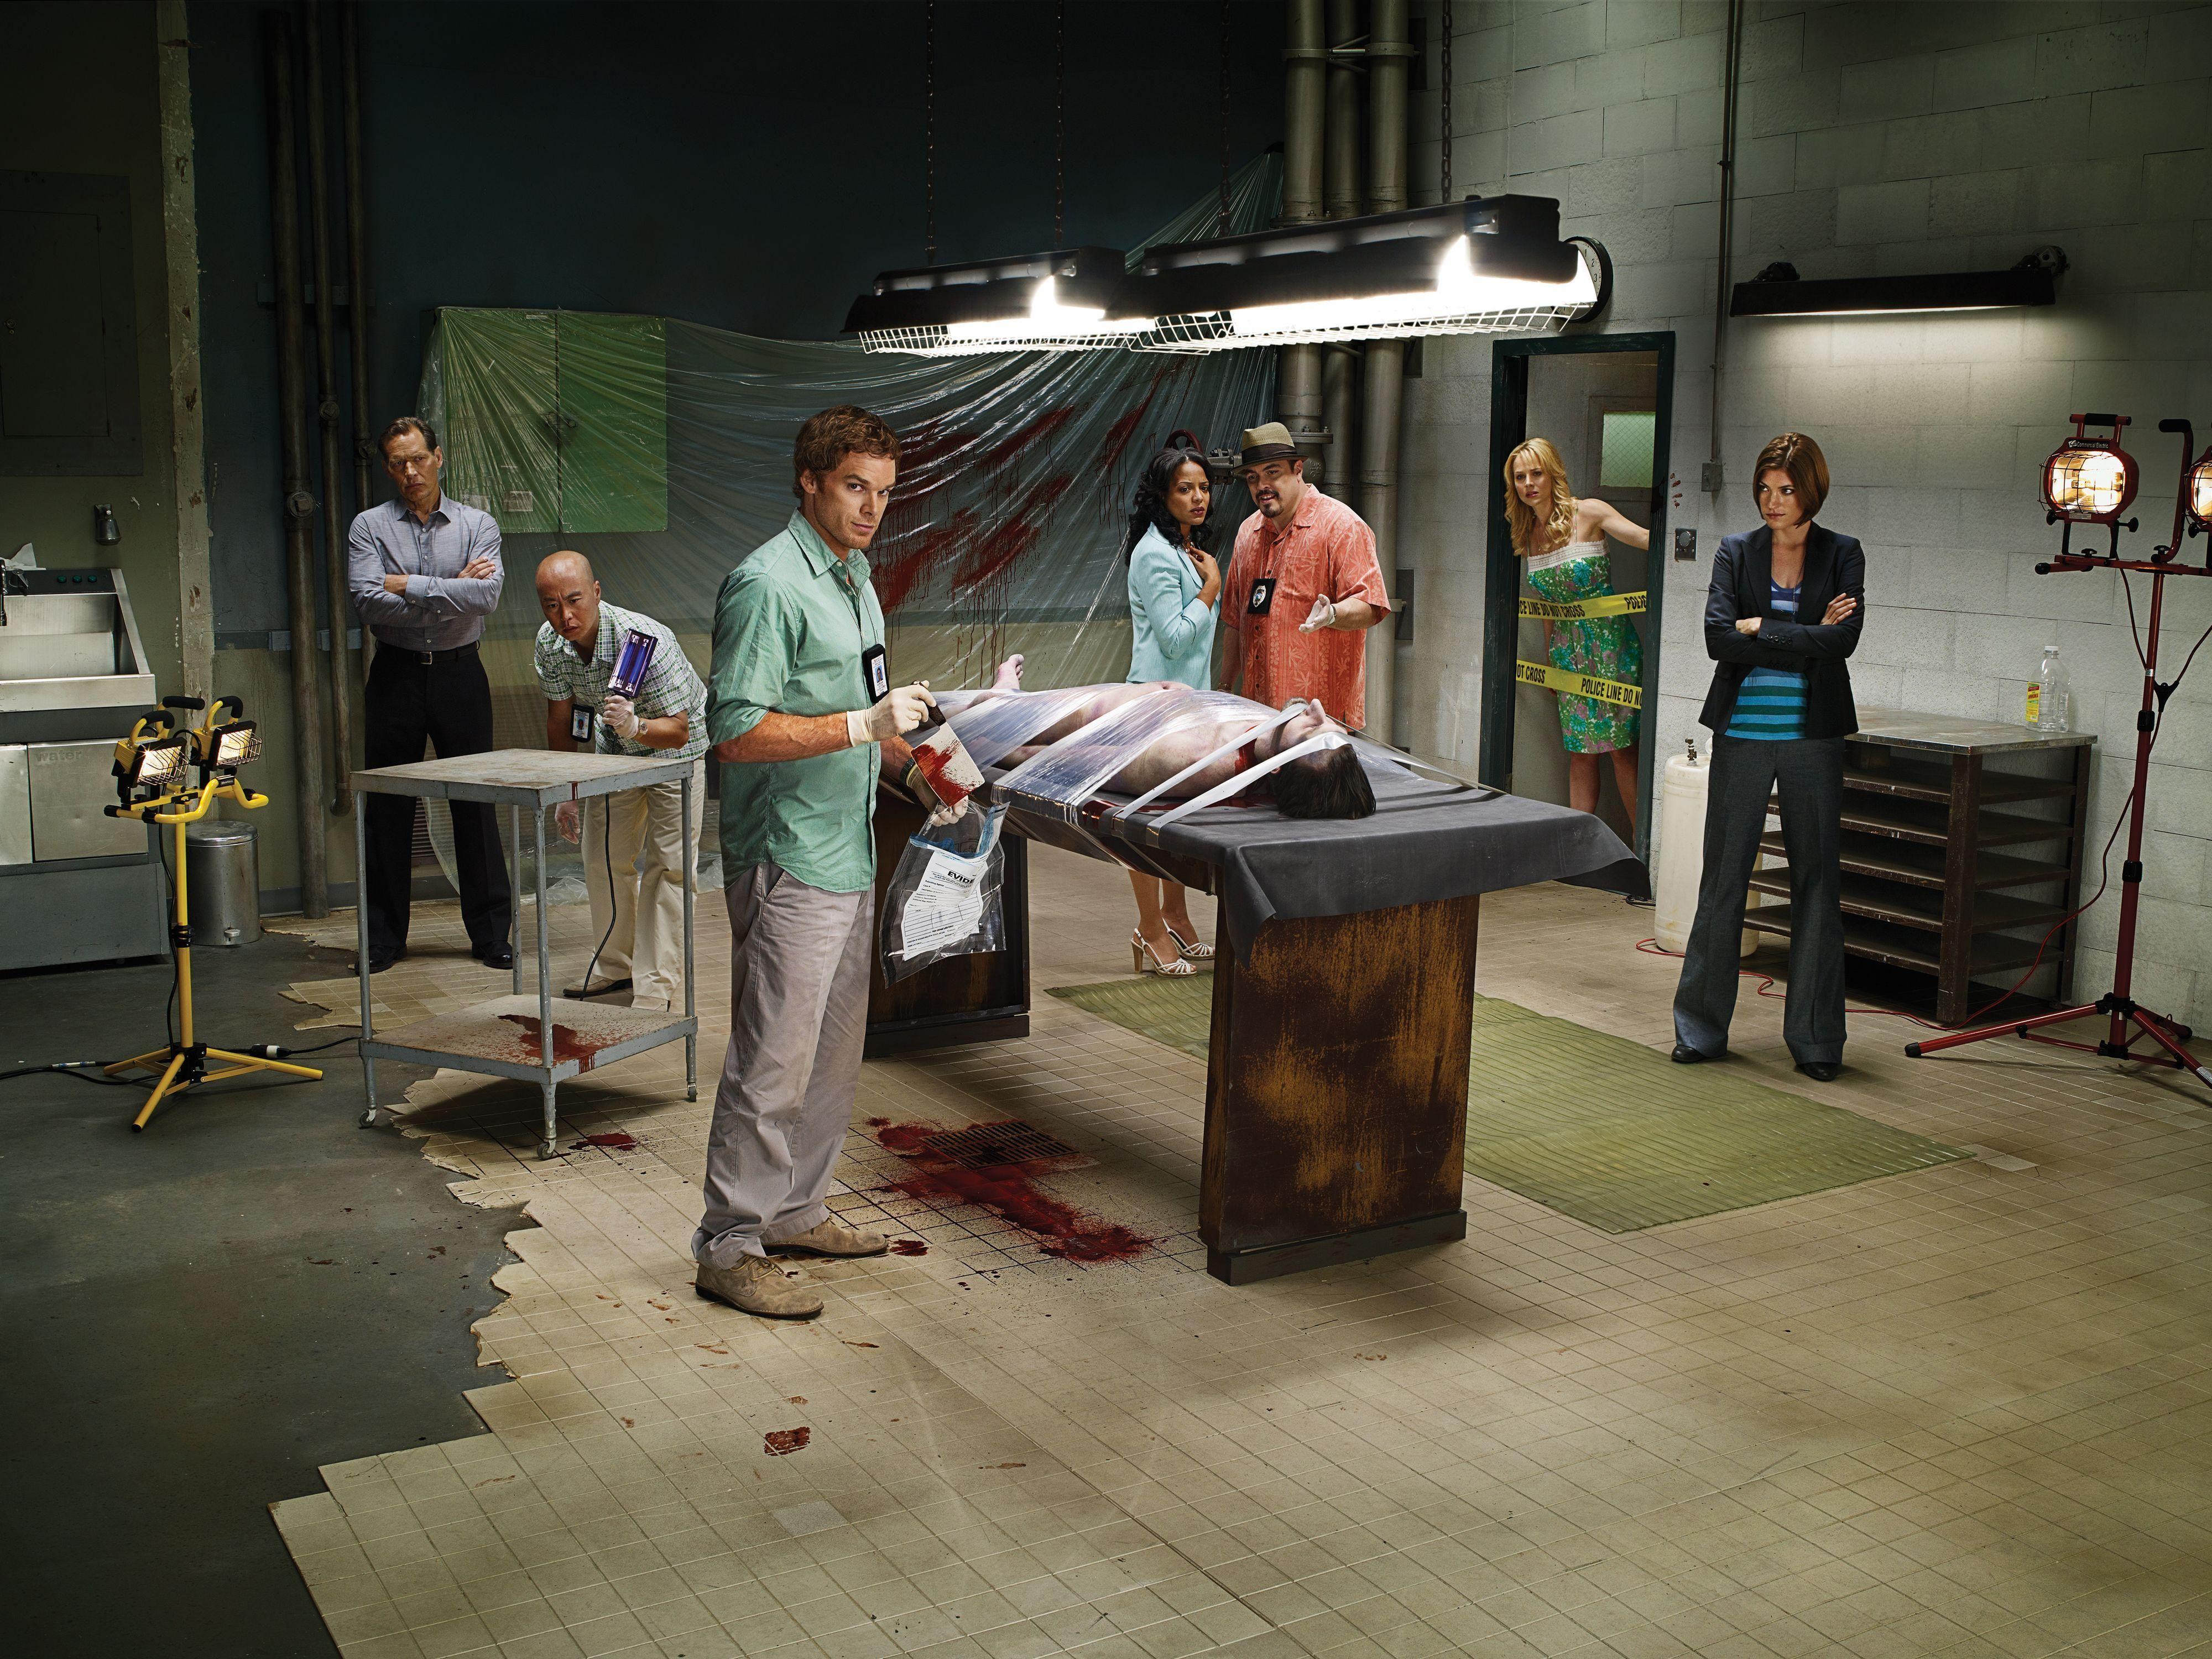 Dexter Season 3 Cast Promo Dexter Wallpaper Dexter Morgan Dexter Tv Series